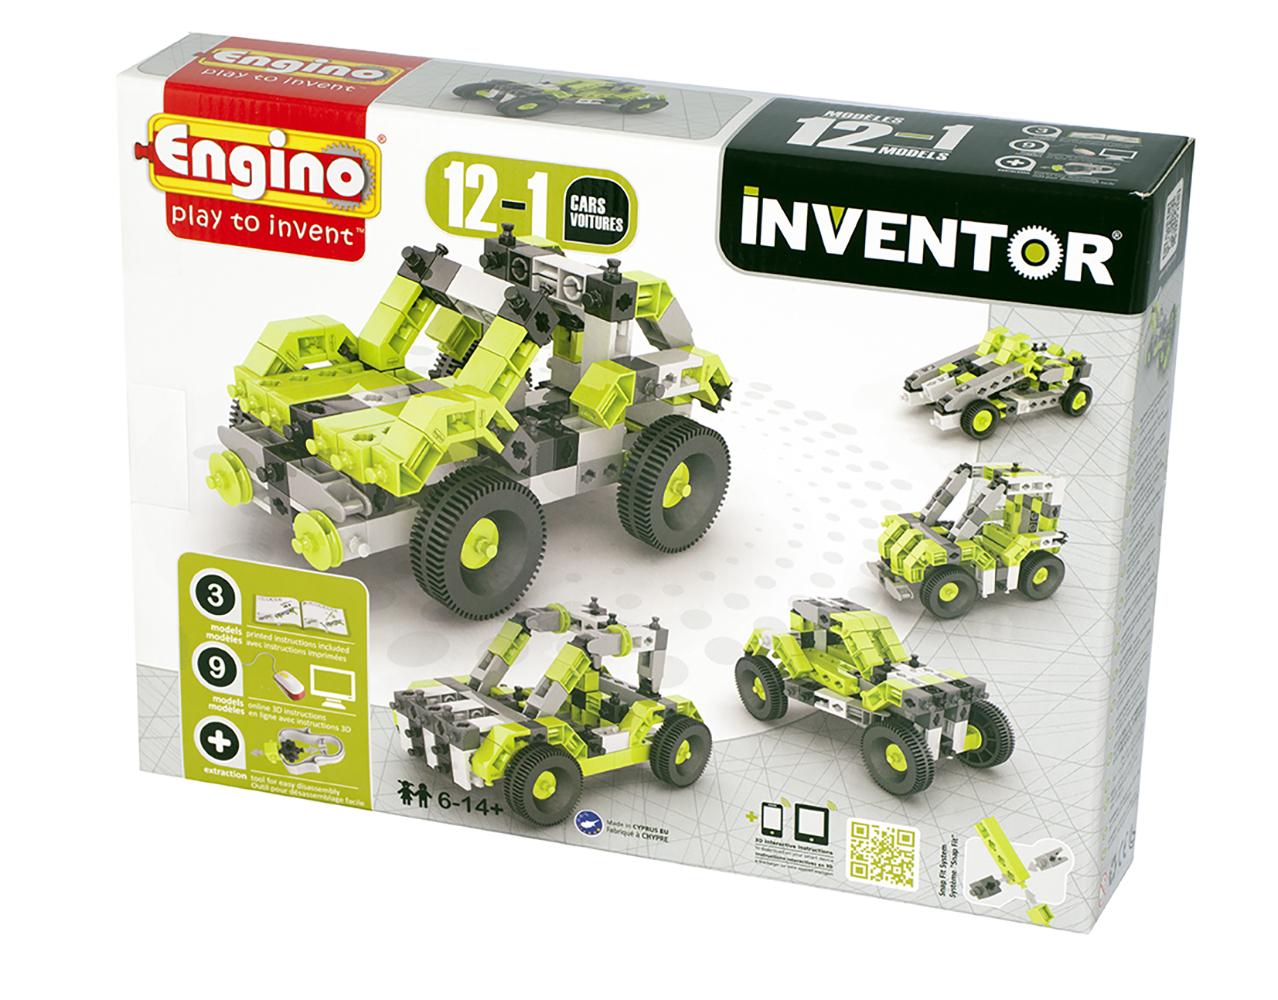 Inventor - 12 Modèles Voitures